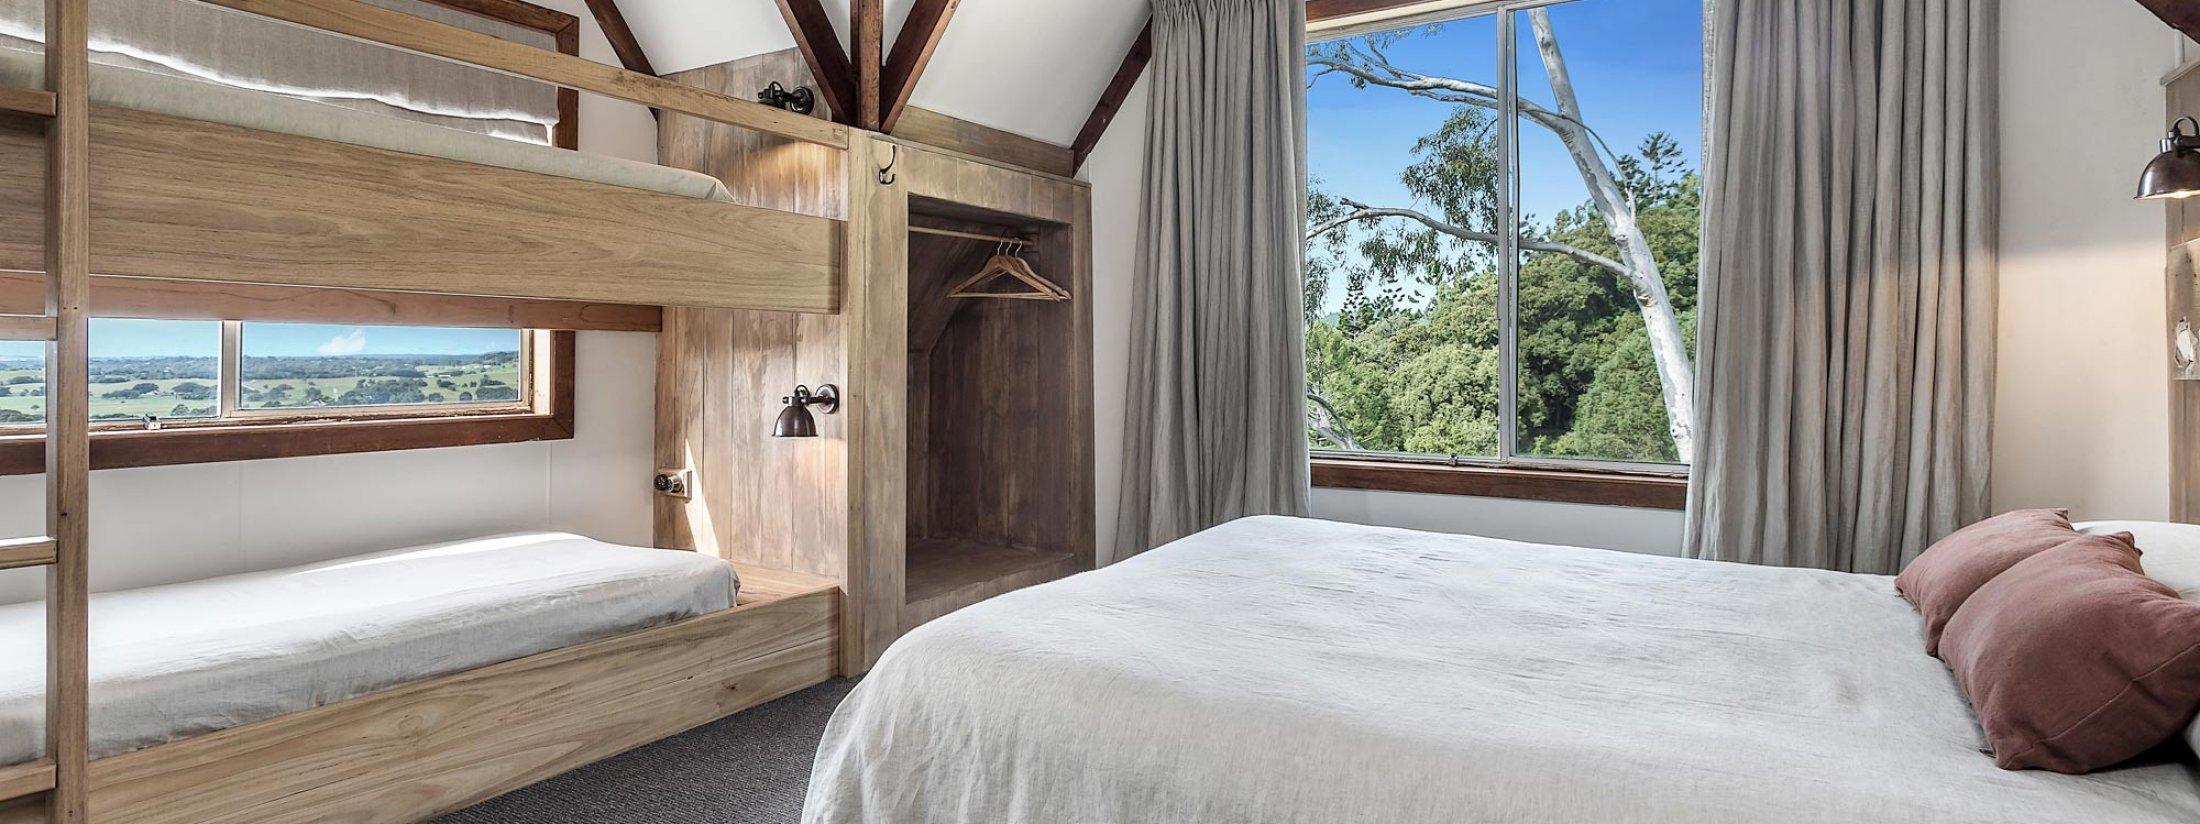 Eastern Rise - Byron Bay Hinterland - Bedroom 3